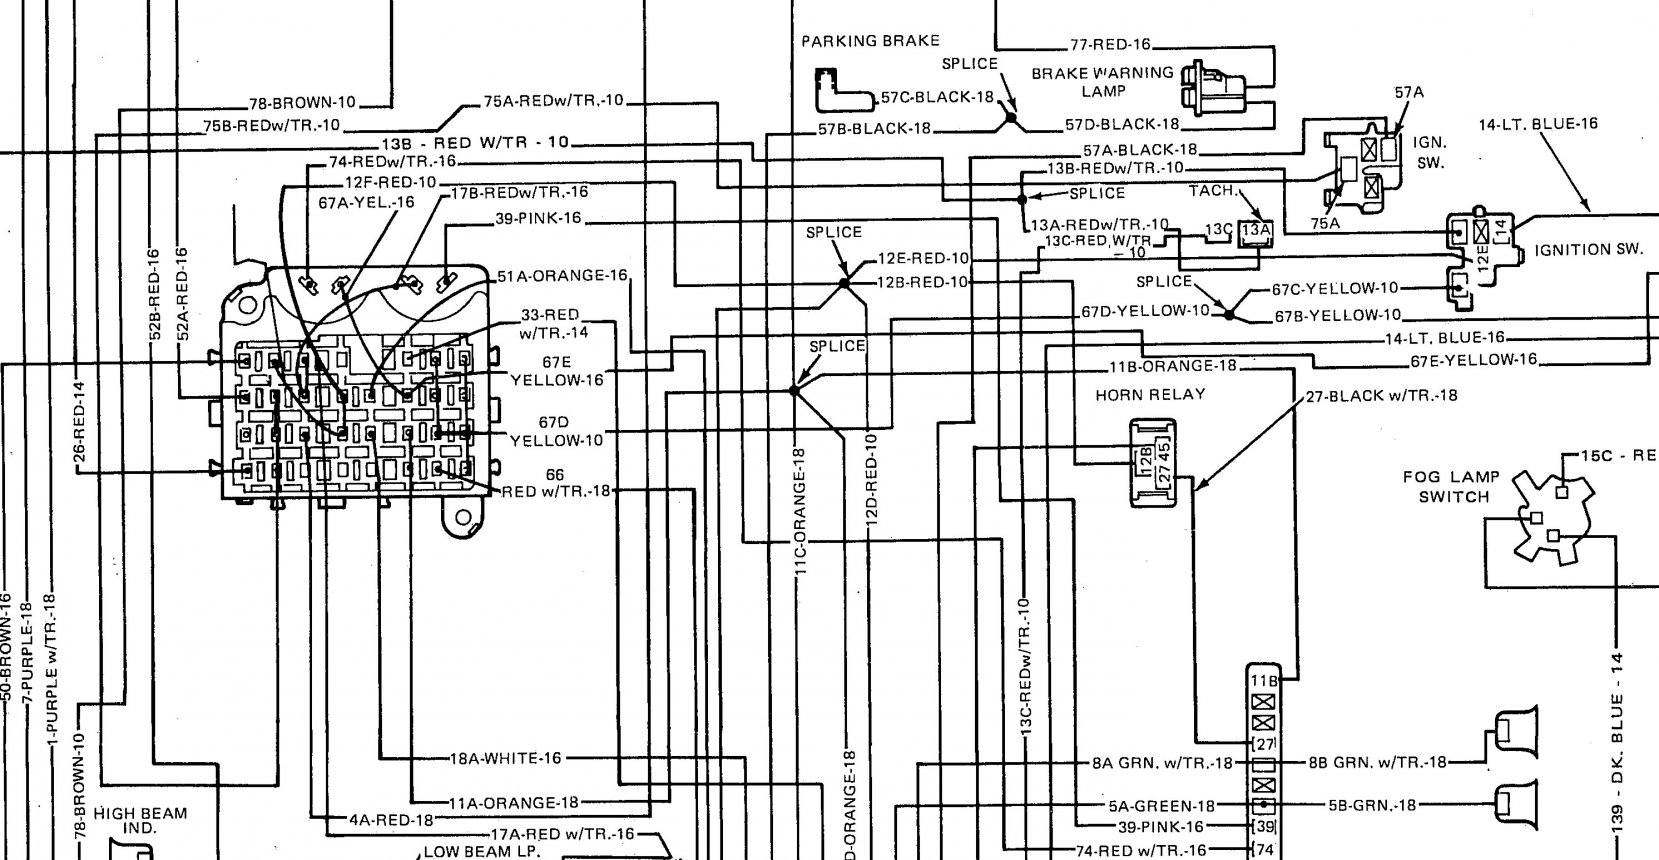 wiring-diagram-detail.jpg